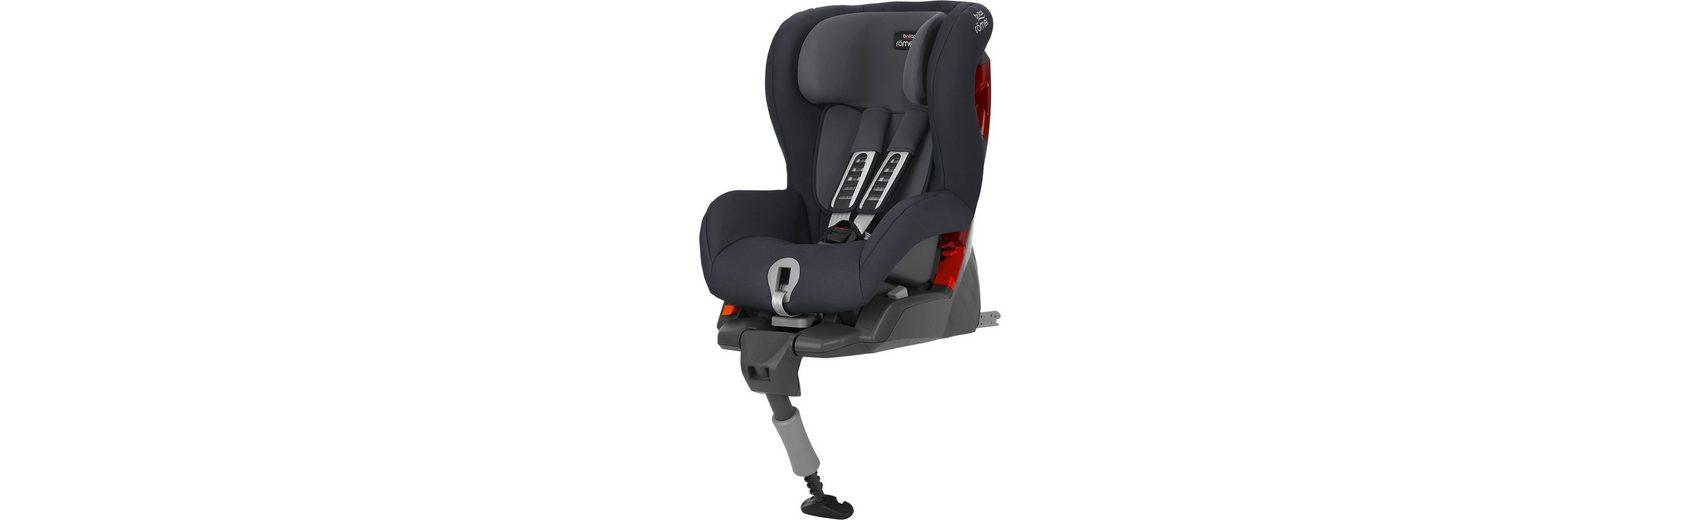 Britax Römer Auto-Kindersitz Safefix Plus, Storm Grey, 2017